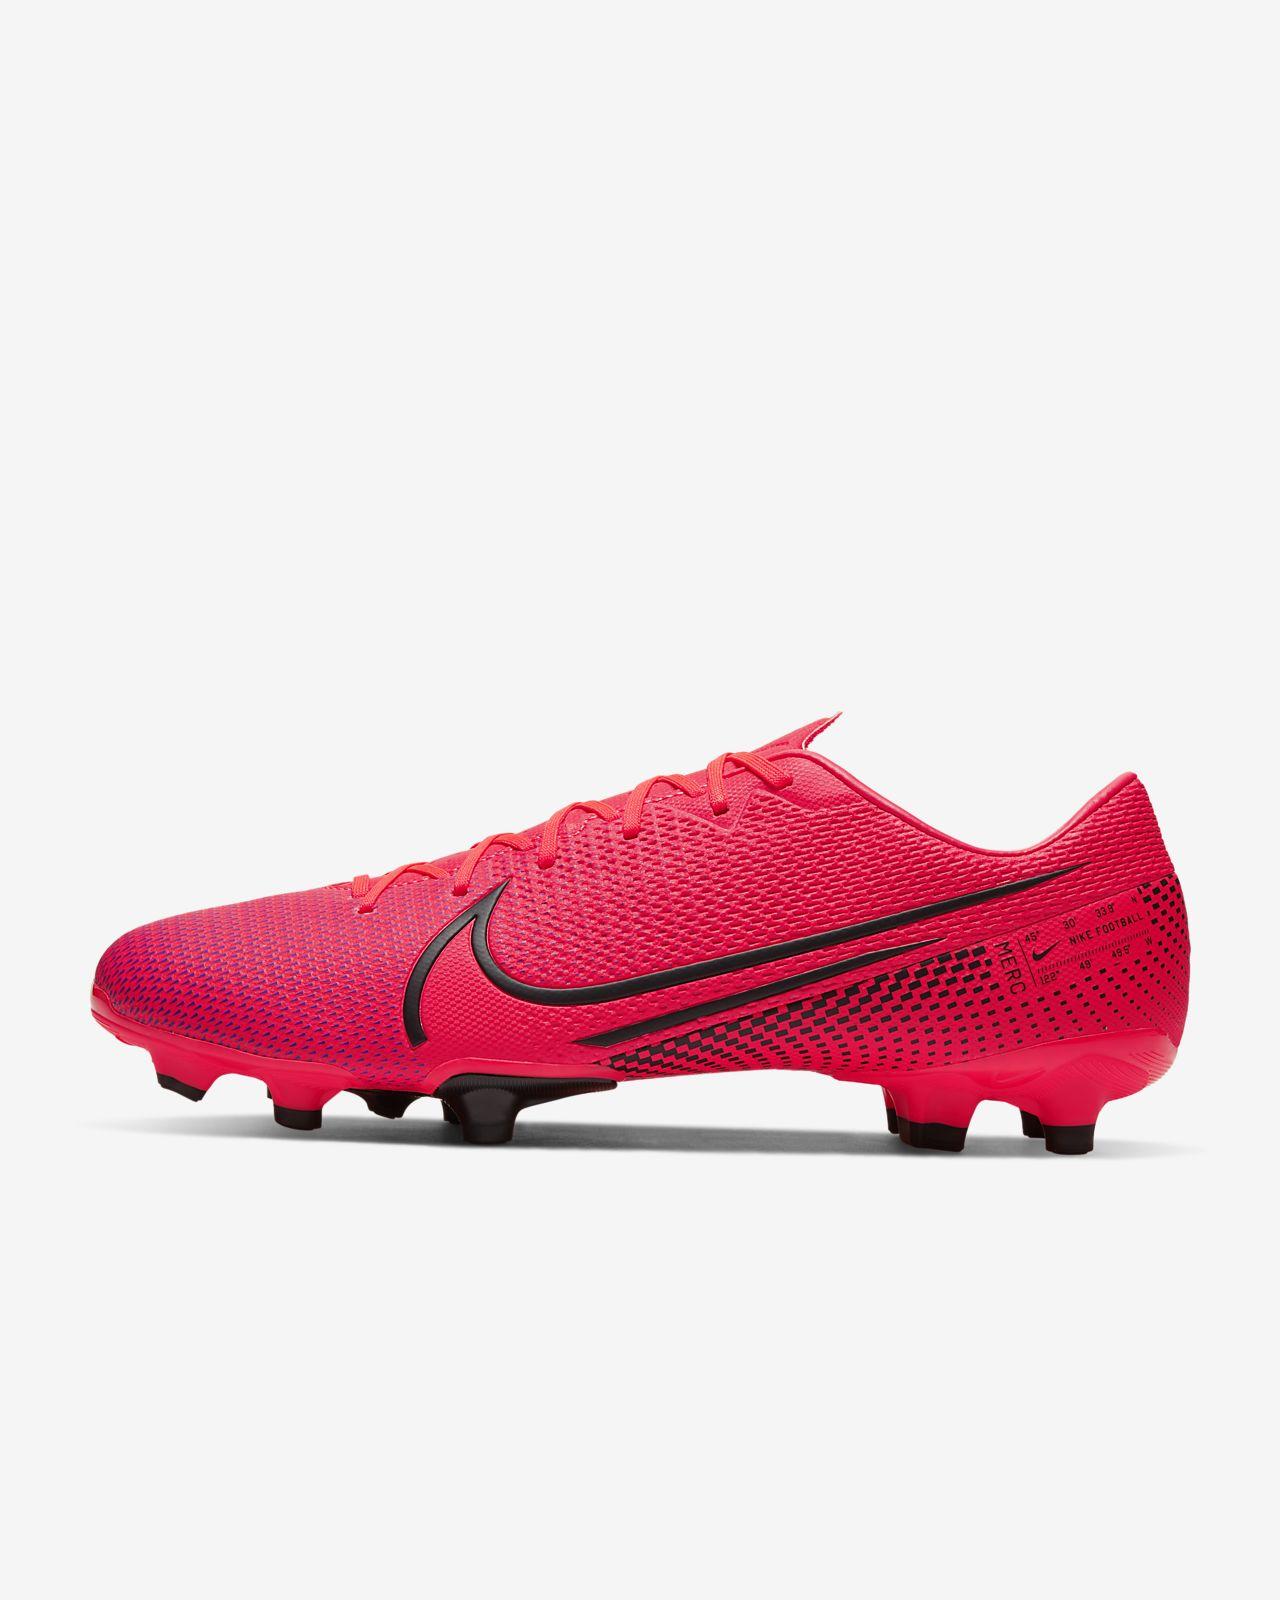 Nike Mercurial Vapor 13 Academy MG Multi-Ground Football Boot